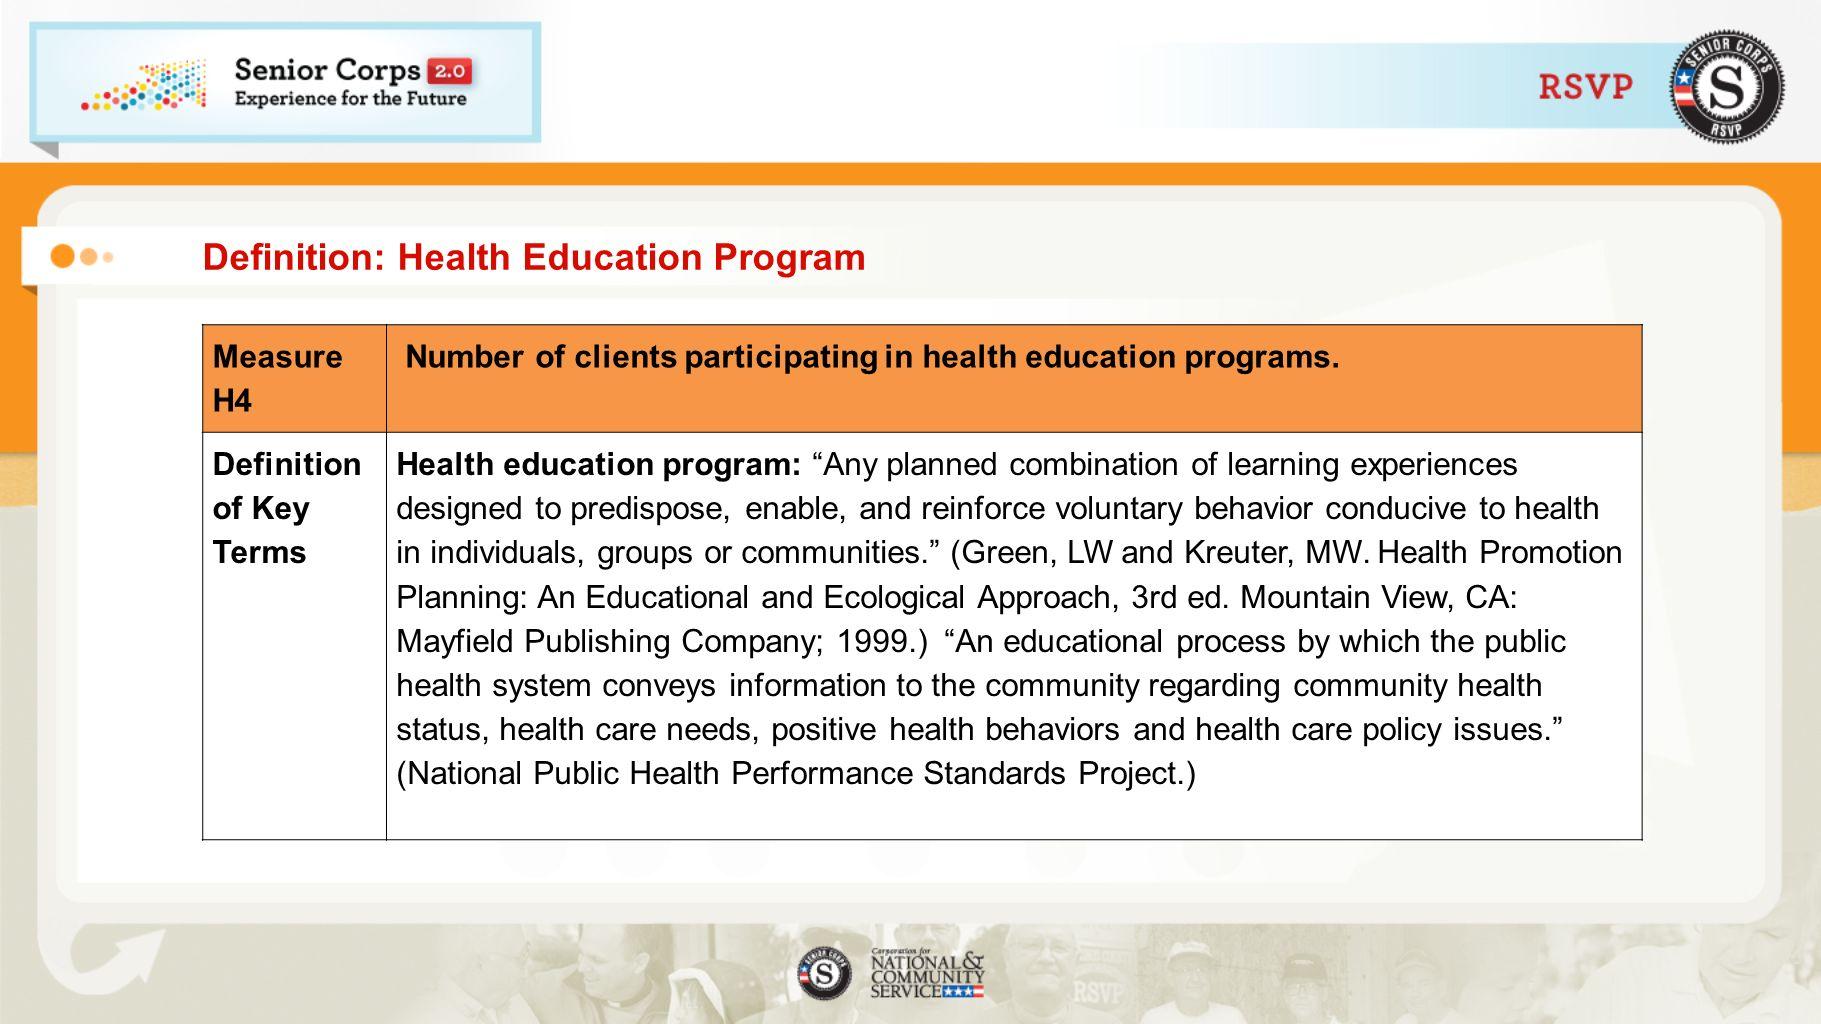 Definition: Health Education Program